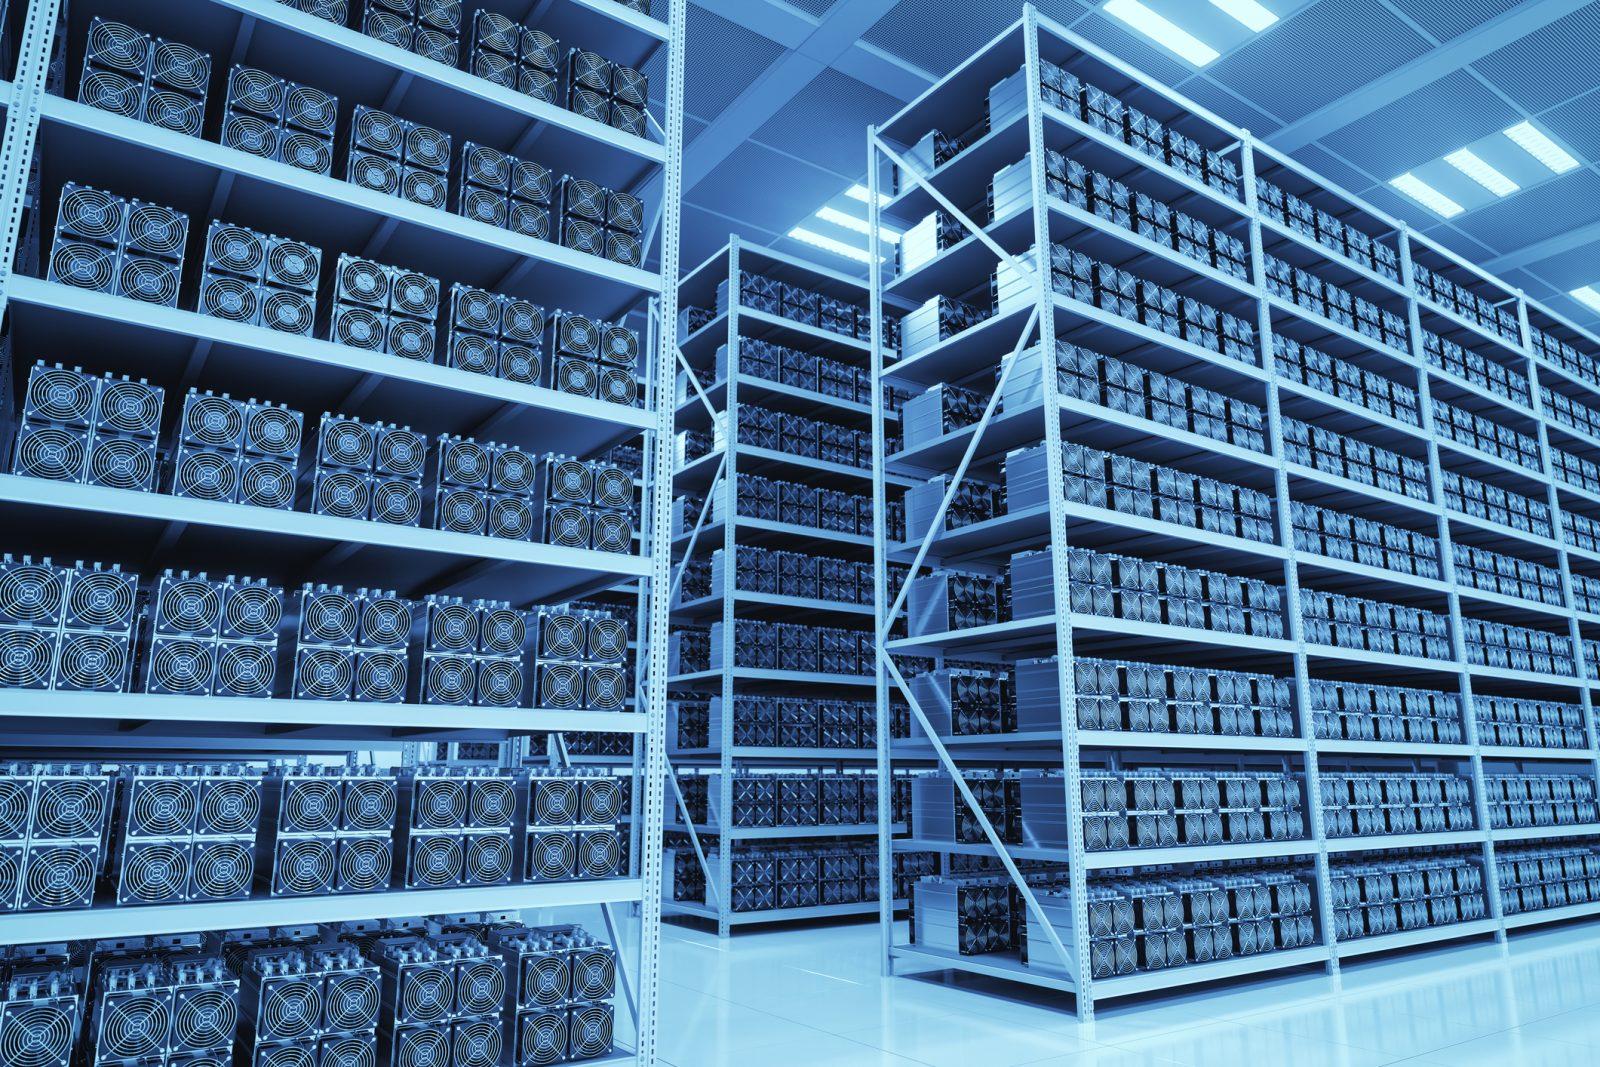 Marathon Digital Holdings Purchases 30,000 S19j Pro Bitcoin Miners from Bitmain